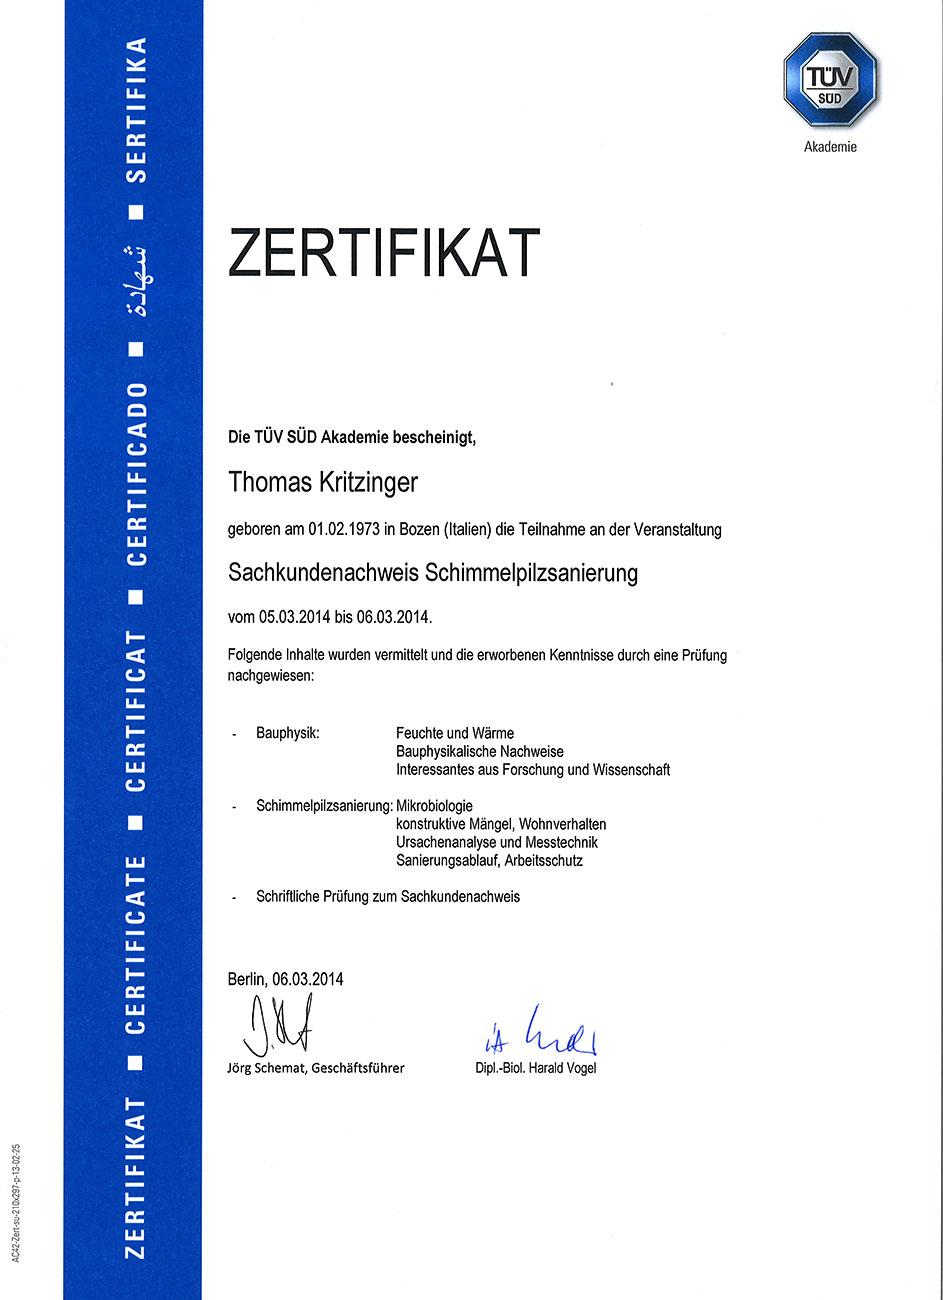 Zertifikat für Schimmelpilzsanierung